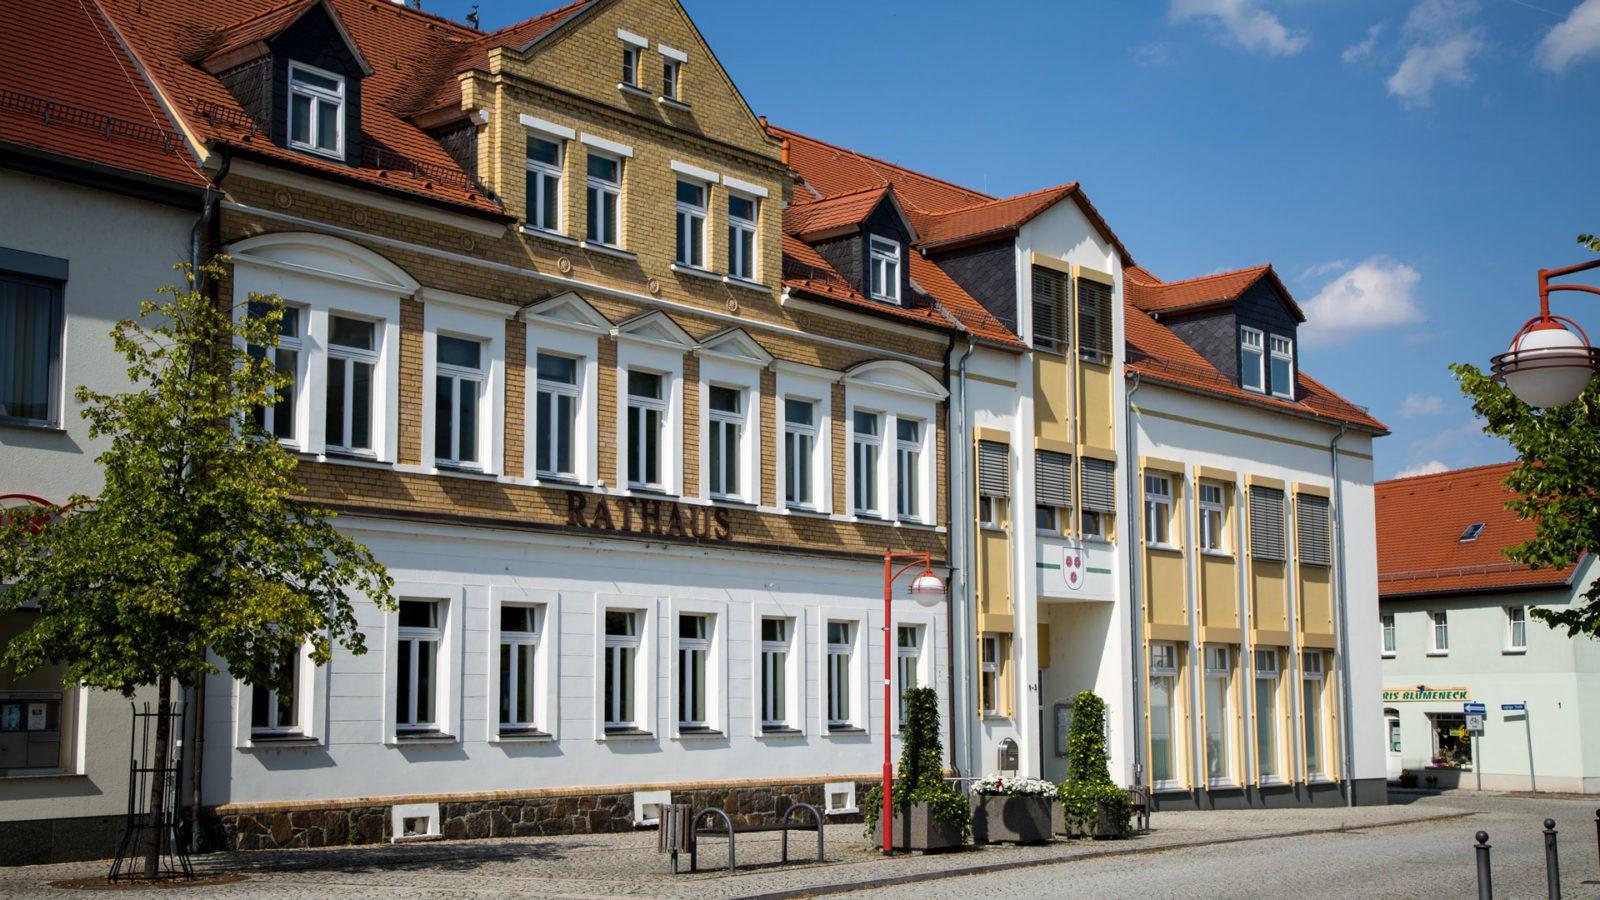 Brandiser Rathaus